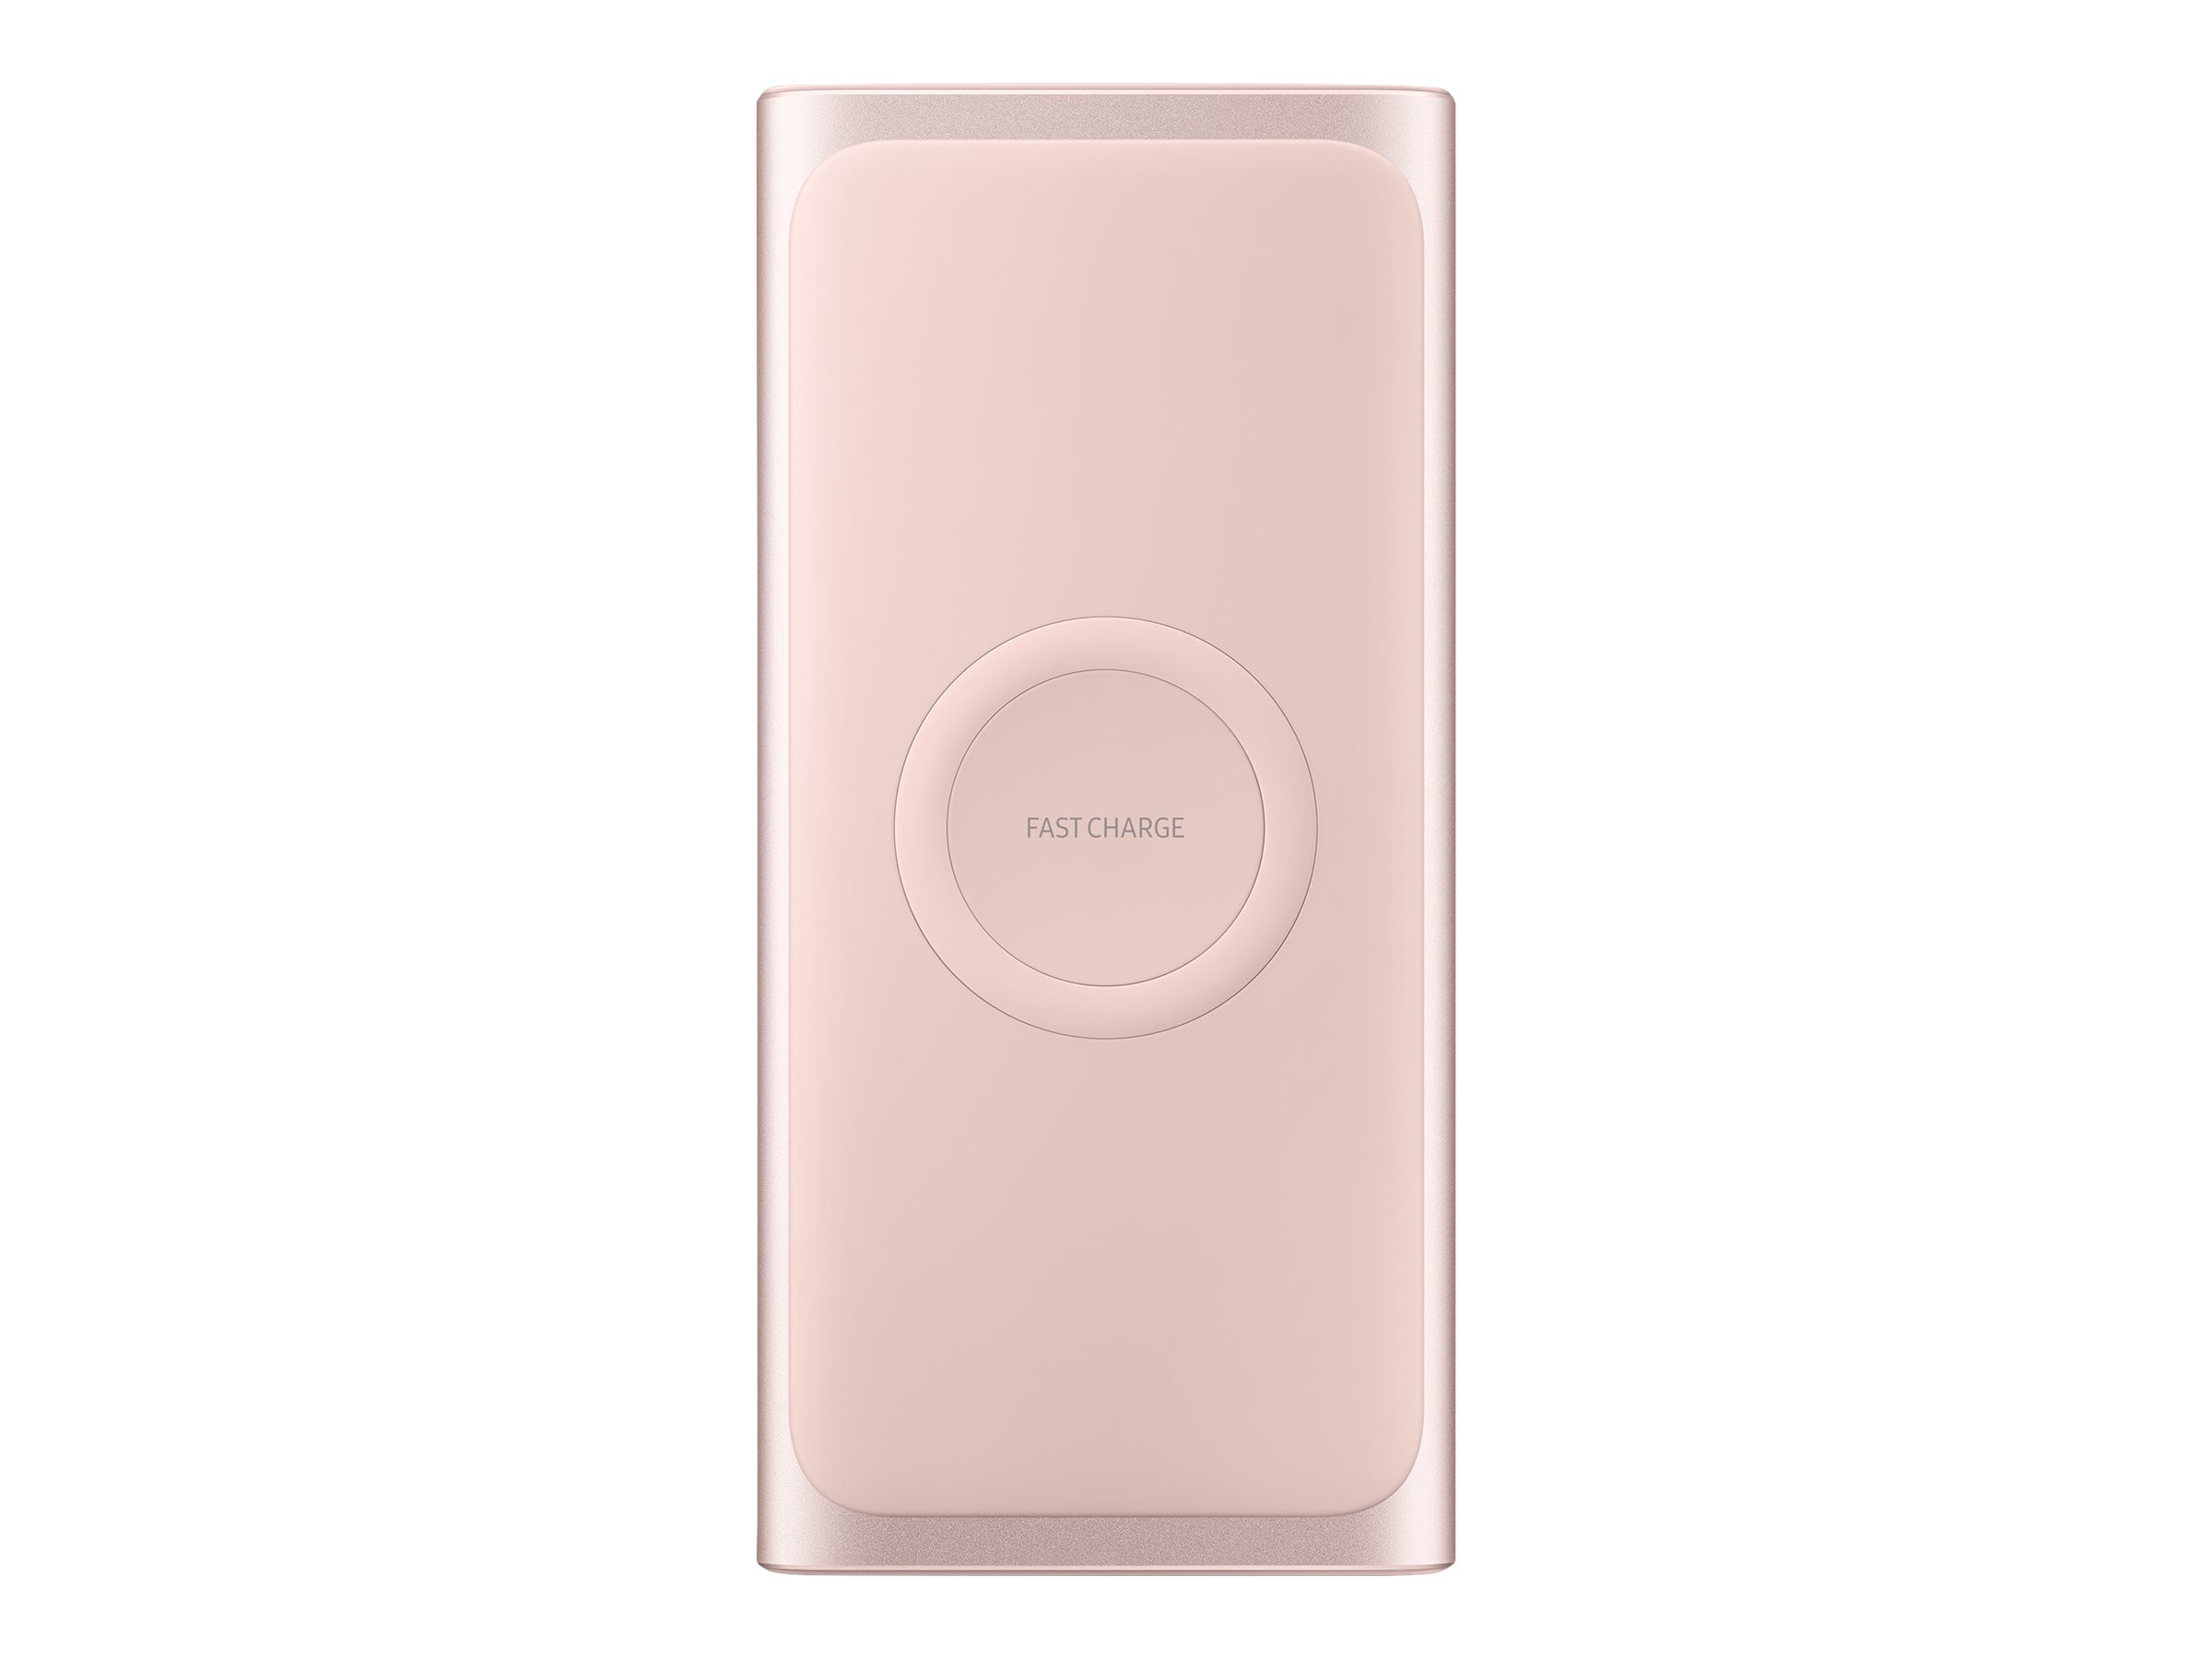 Samsung Wireless Battery Pack EB-U1200 - Matte für kabelloses Laden / Powerbank - 10000 mAh - 2 A - Fast Charge (USB) - auf Kabe